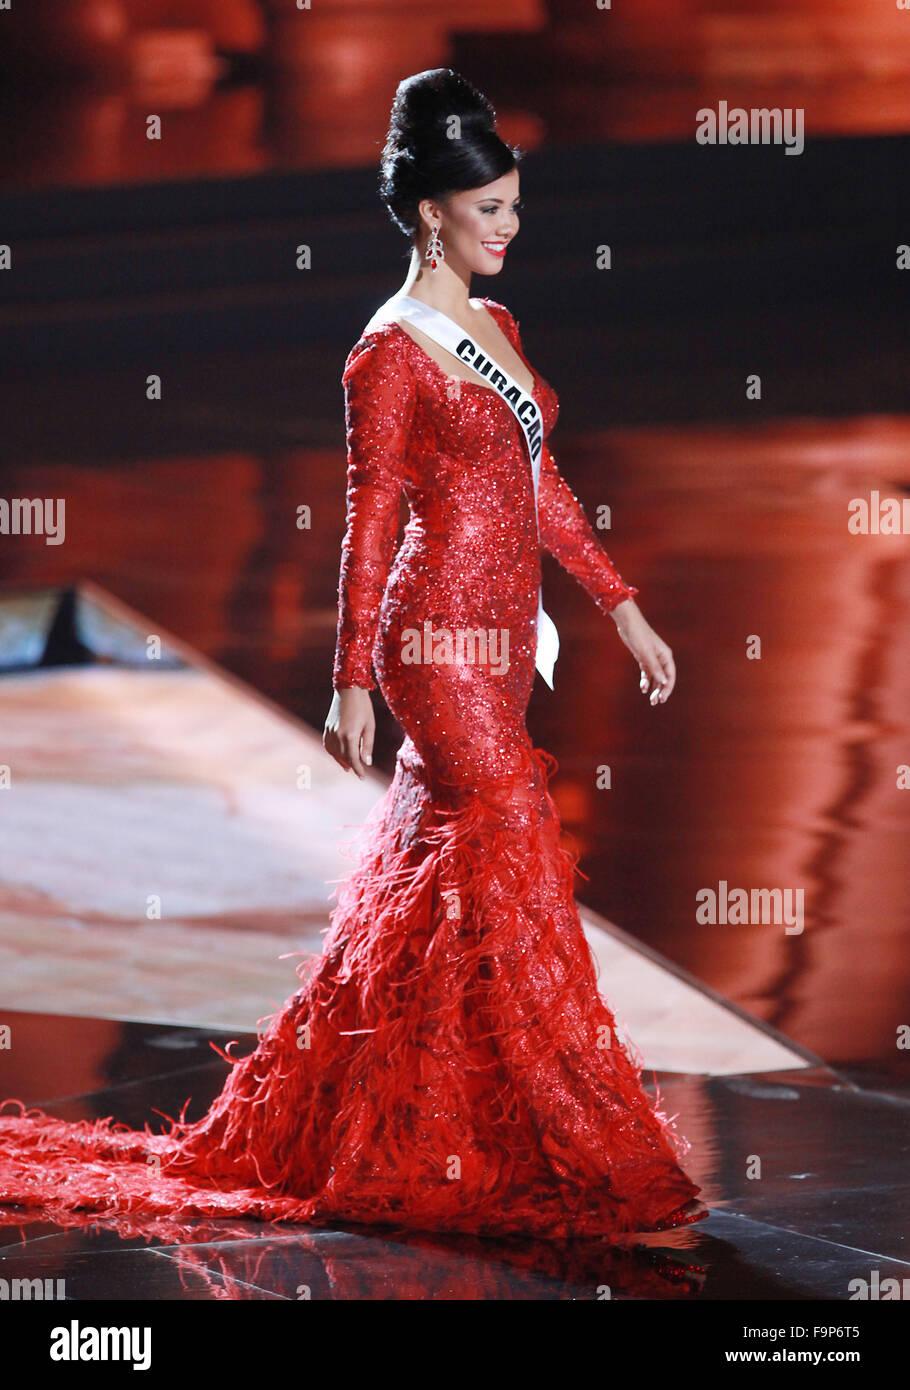 Las Vegas, Nevada, USA  16th Dec, 2015  Miss Curacao Kanisha Sluis